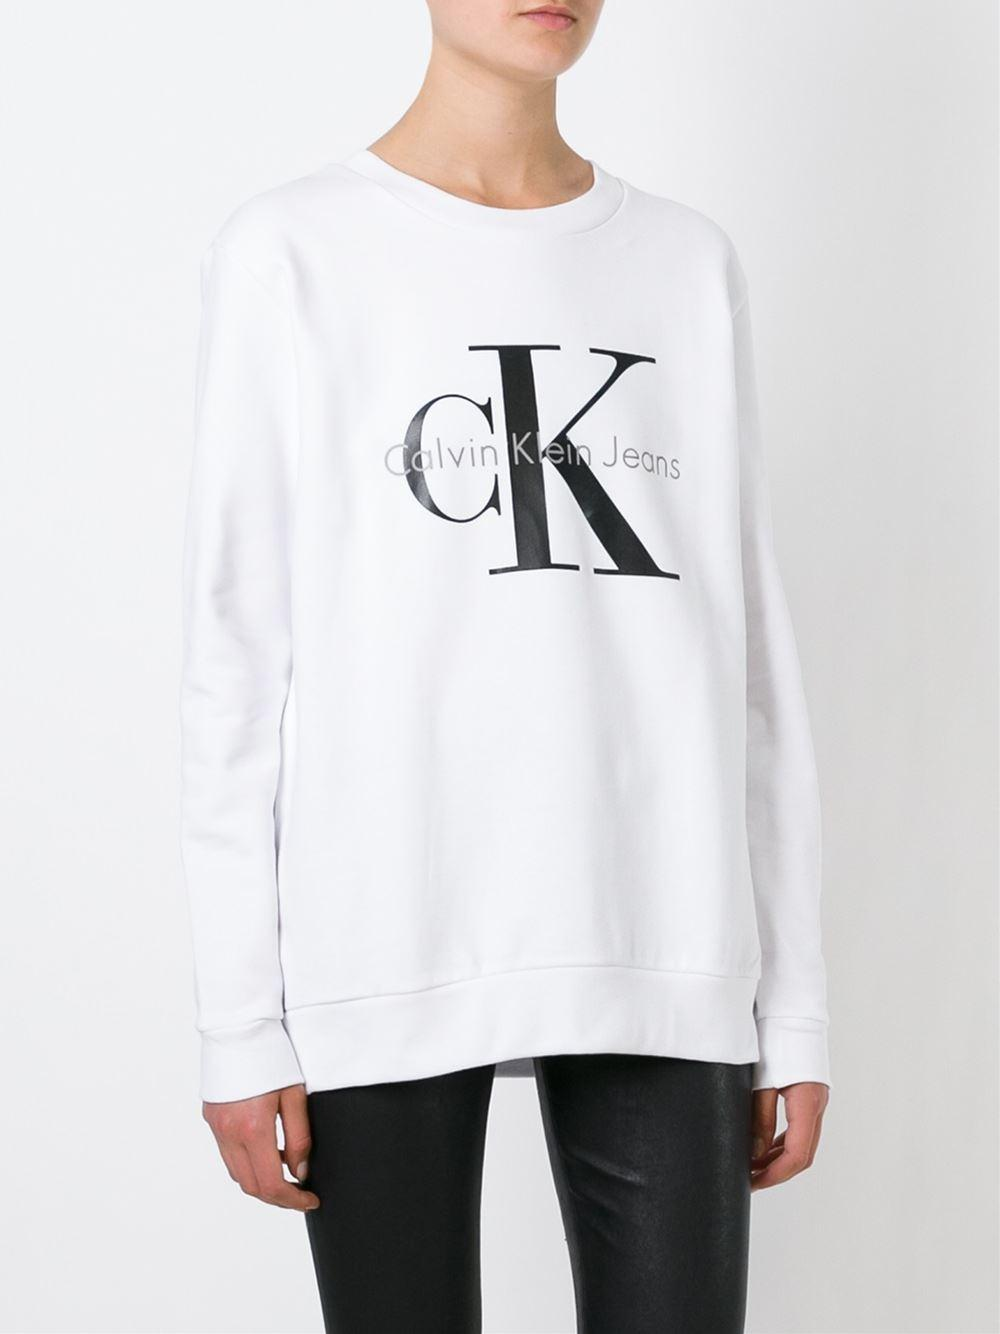 calvin klein jeans logo print sweatshirt in white lyst. Black Bedroom Furniture Sets. Home Design Ideas